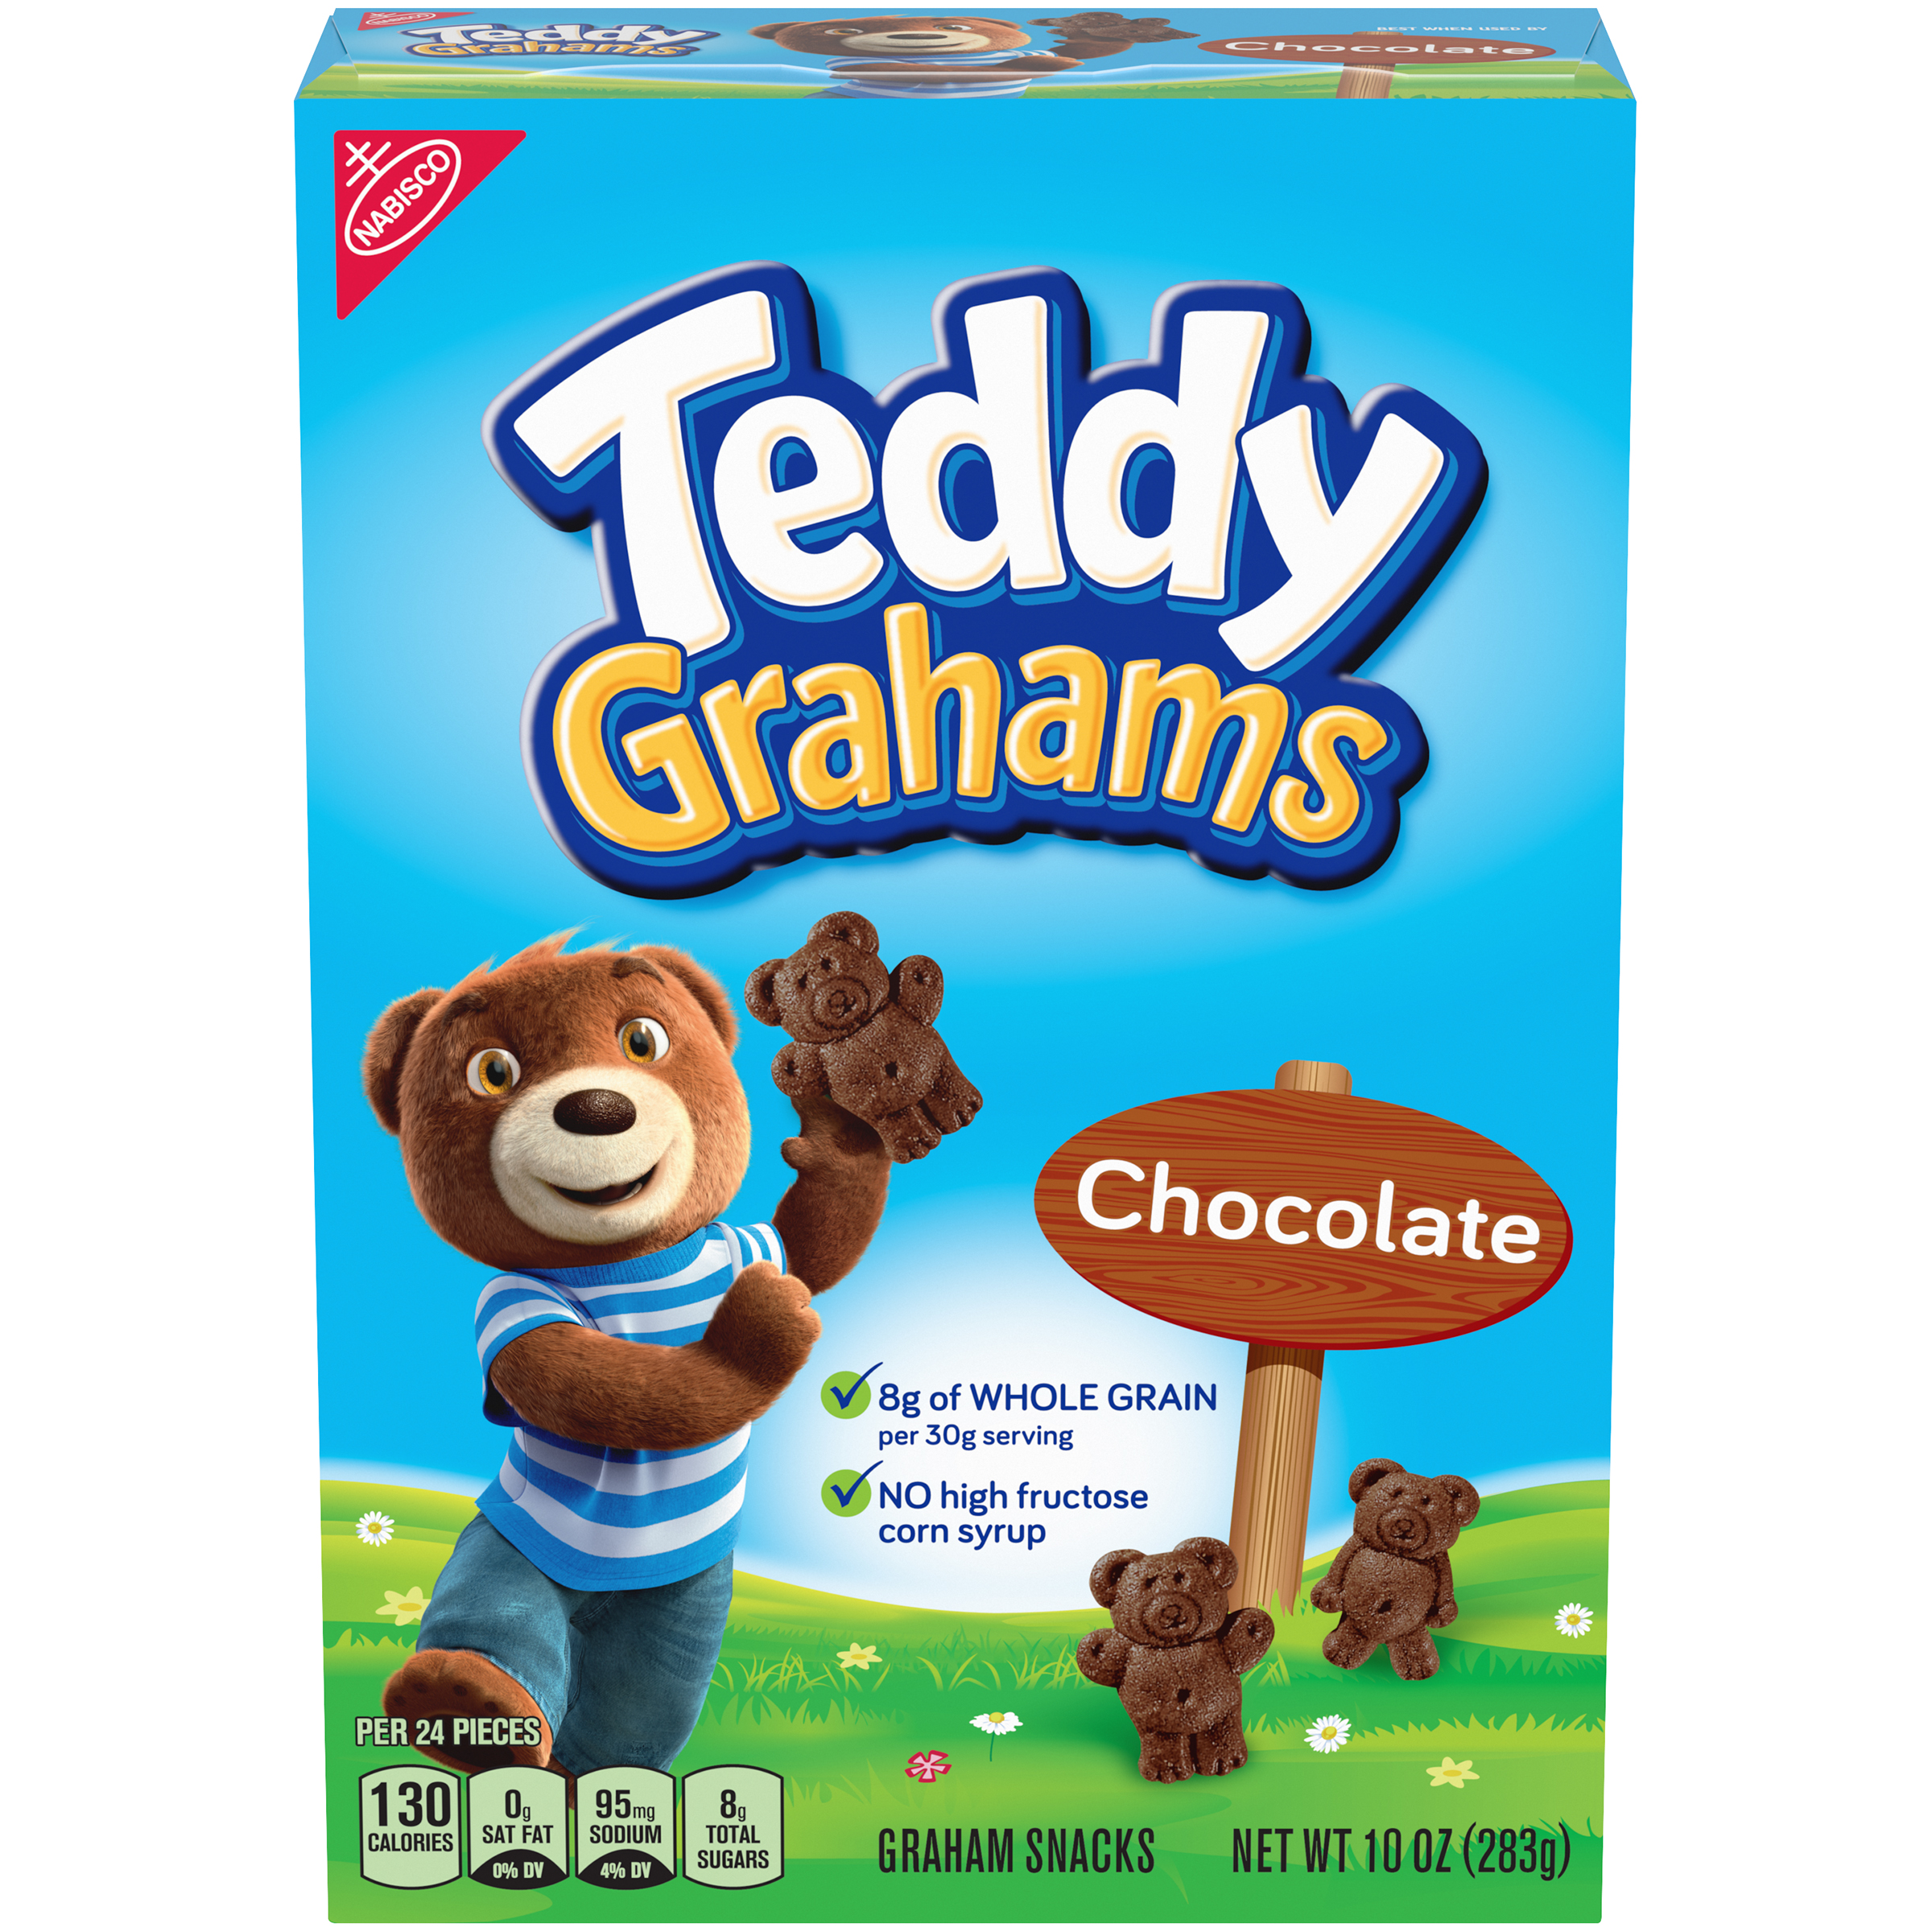 TEDDY GRAHAMS Chocolate Cookies 10 oz